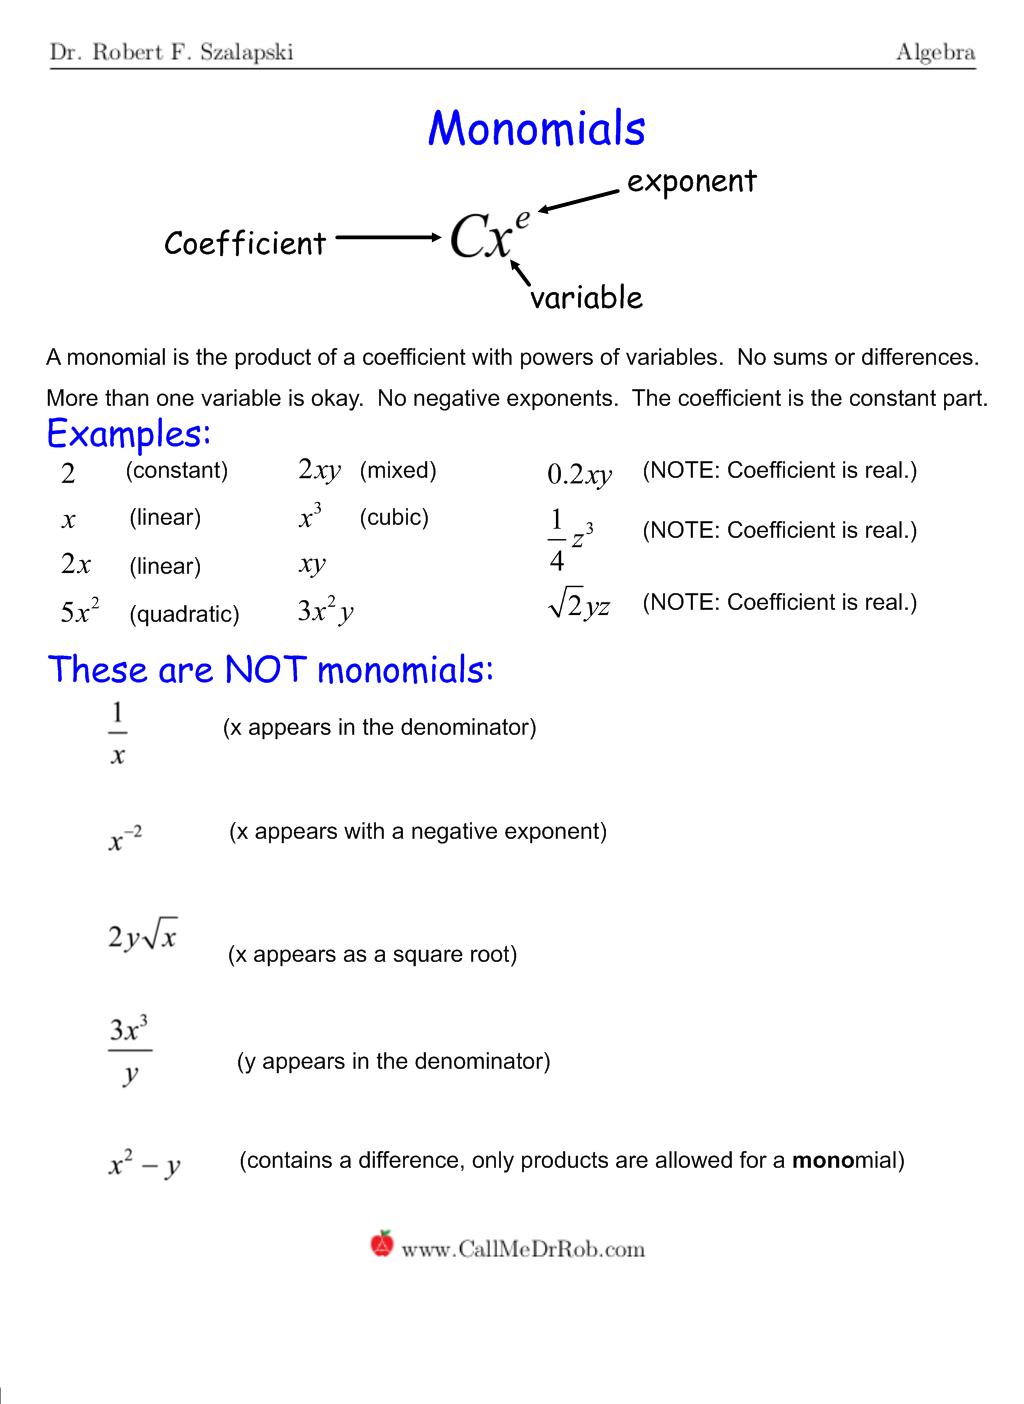 Monomials - page 1